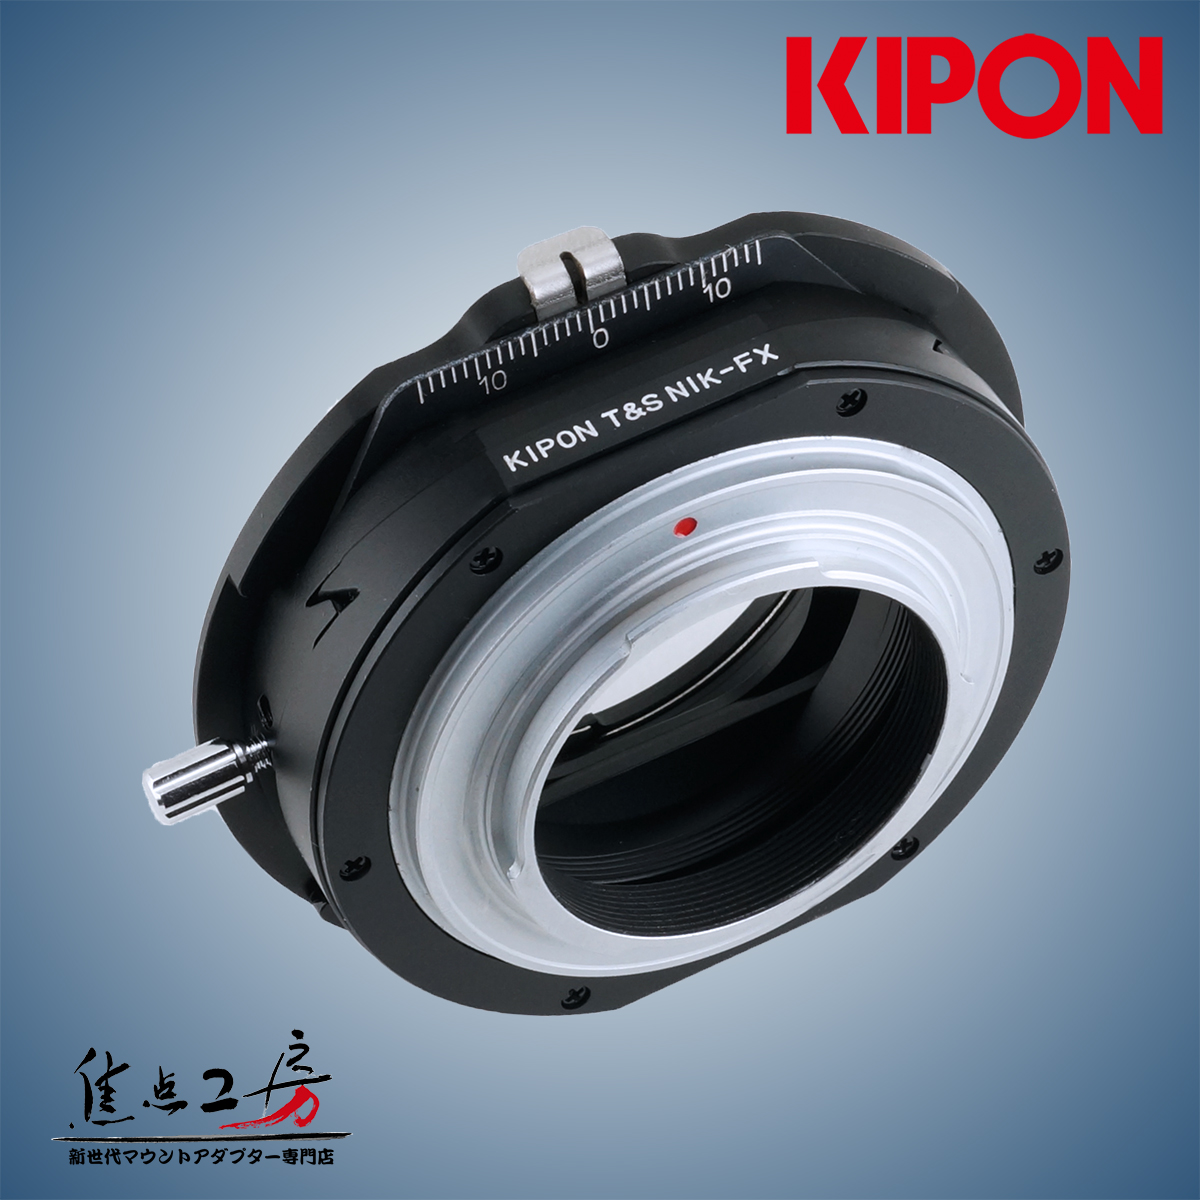 KIPON T&S NIK-FX ニコンFマウントレンズ - 富士フィルムXマウントアダプター アオリ(ティルト&シフト)機構搭載